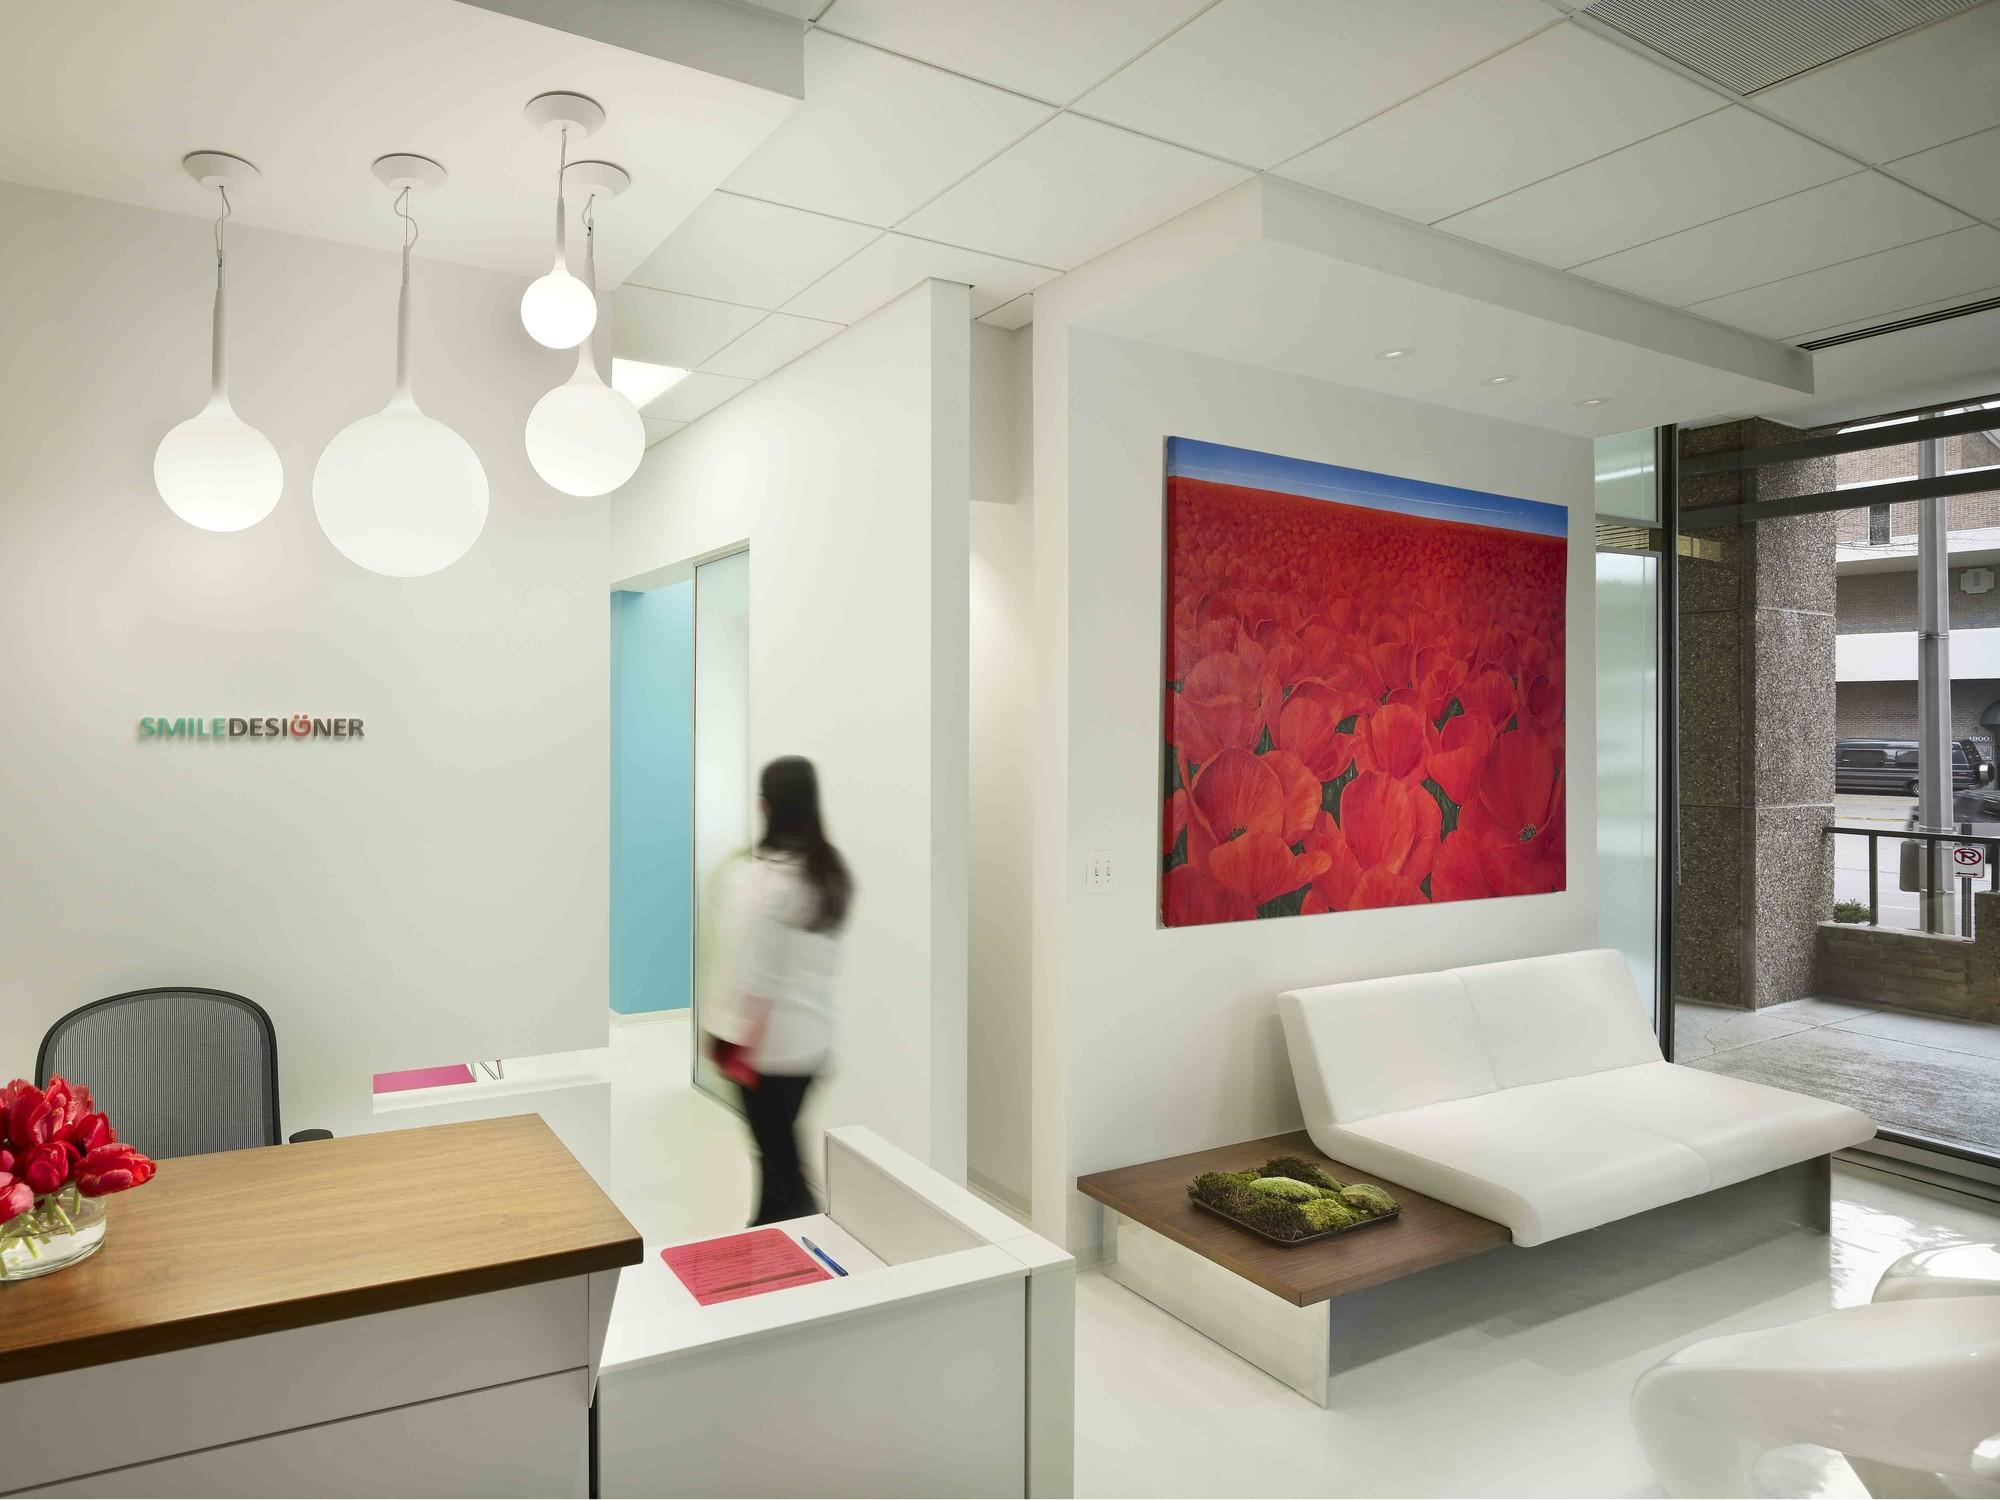 Gallery Of Smile Designer Dental Office Interiors Antonio Sofan 8